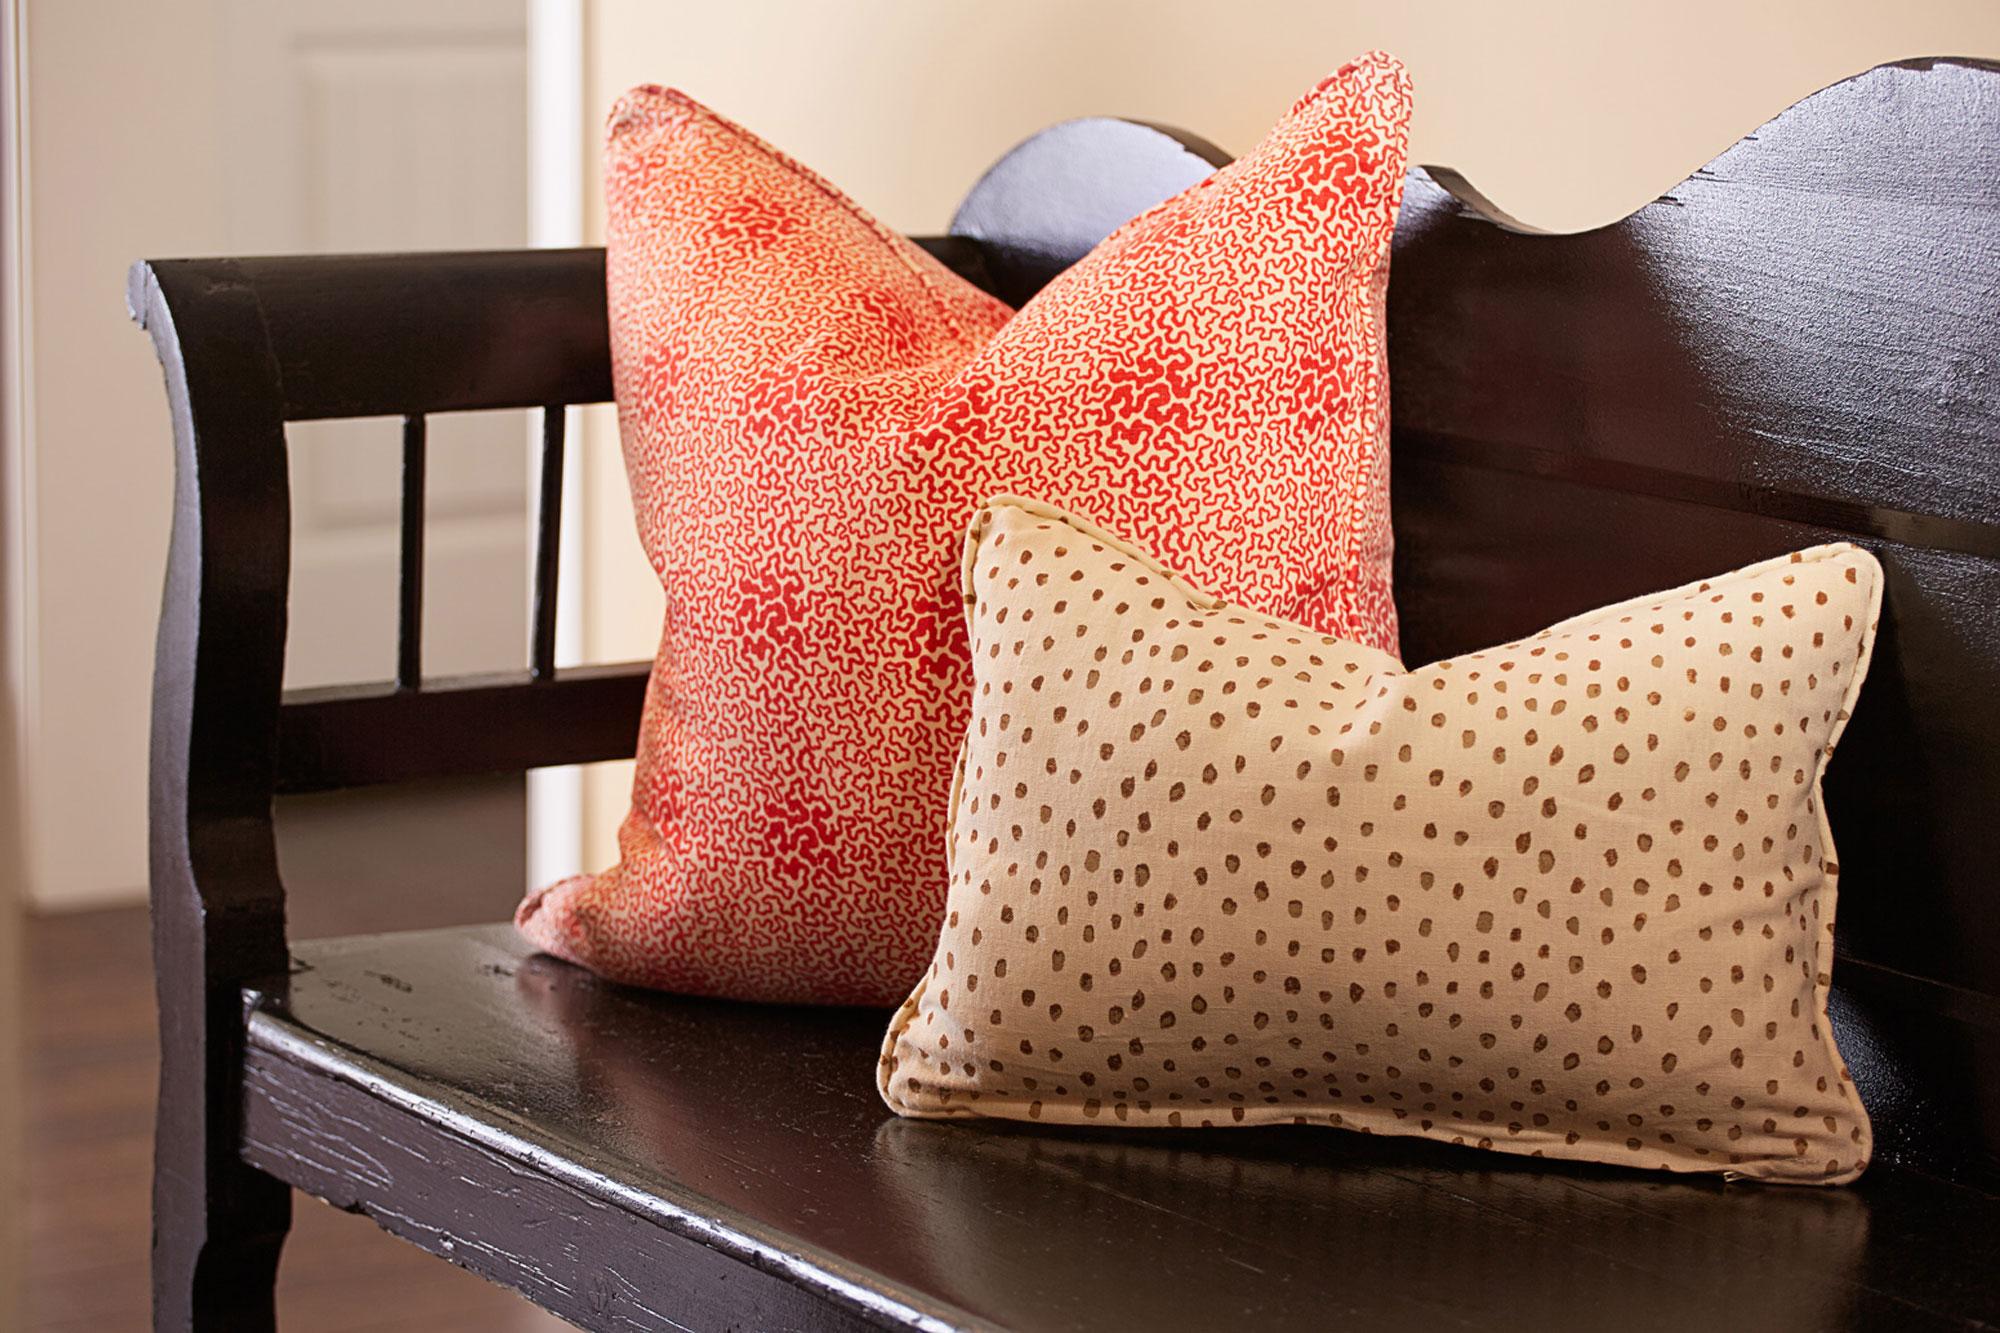 lygia-harkins-interiors-Calle-Tuberia-pillows-1000pxW.jpg